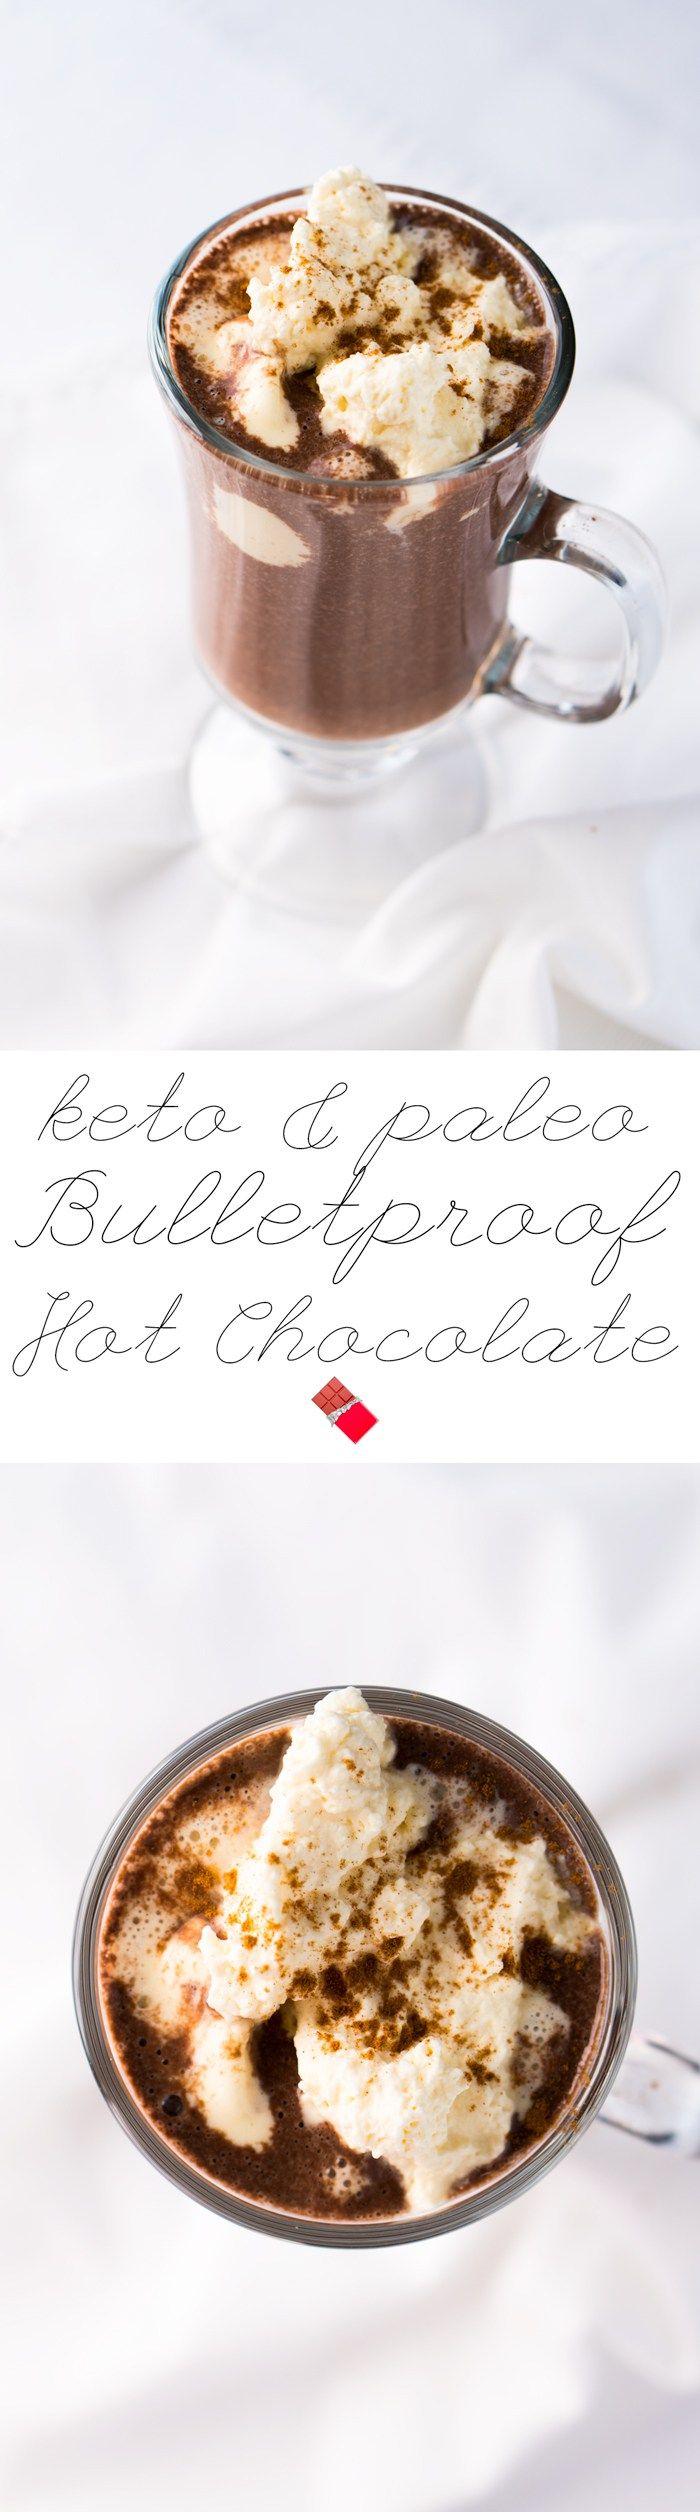 Keto Bulletproof Hot Chocolate 2g net carbs #ketohotchocolate #bulletproof #lowcarbchocolate